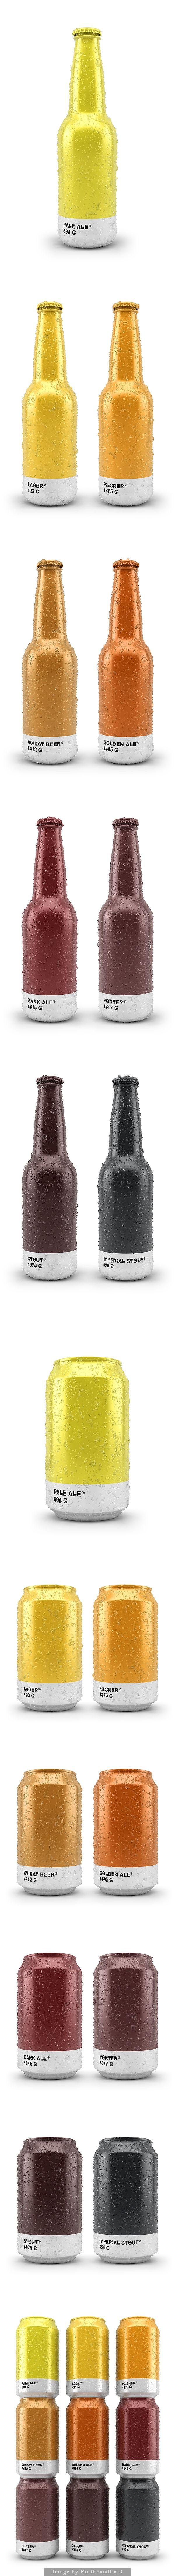 Beer packaging fun. Choosing what you drink by your favorite Pantone color curated by Packaging Diva PD created via http://www.creativebloq.com/branding/beer-packaging-takes-inspiration-pantone-91412935